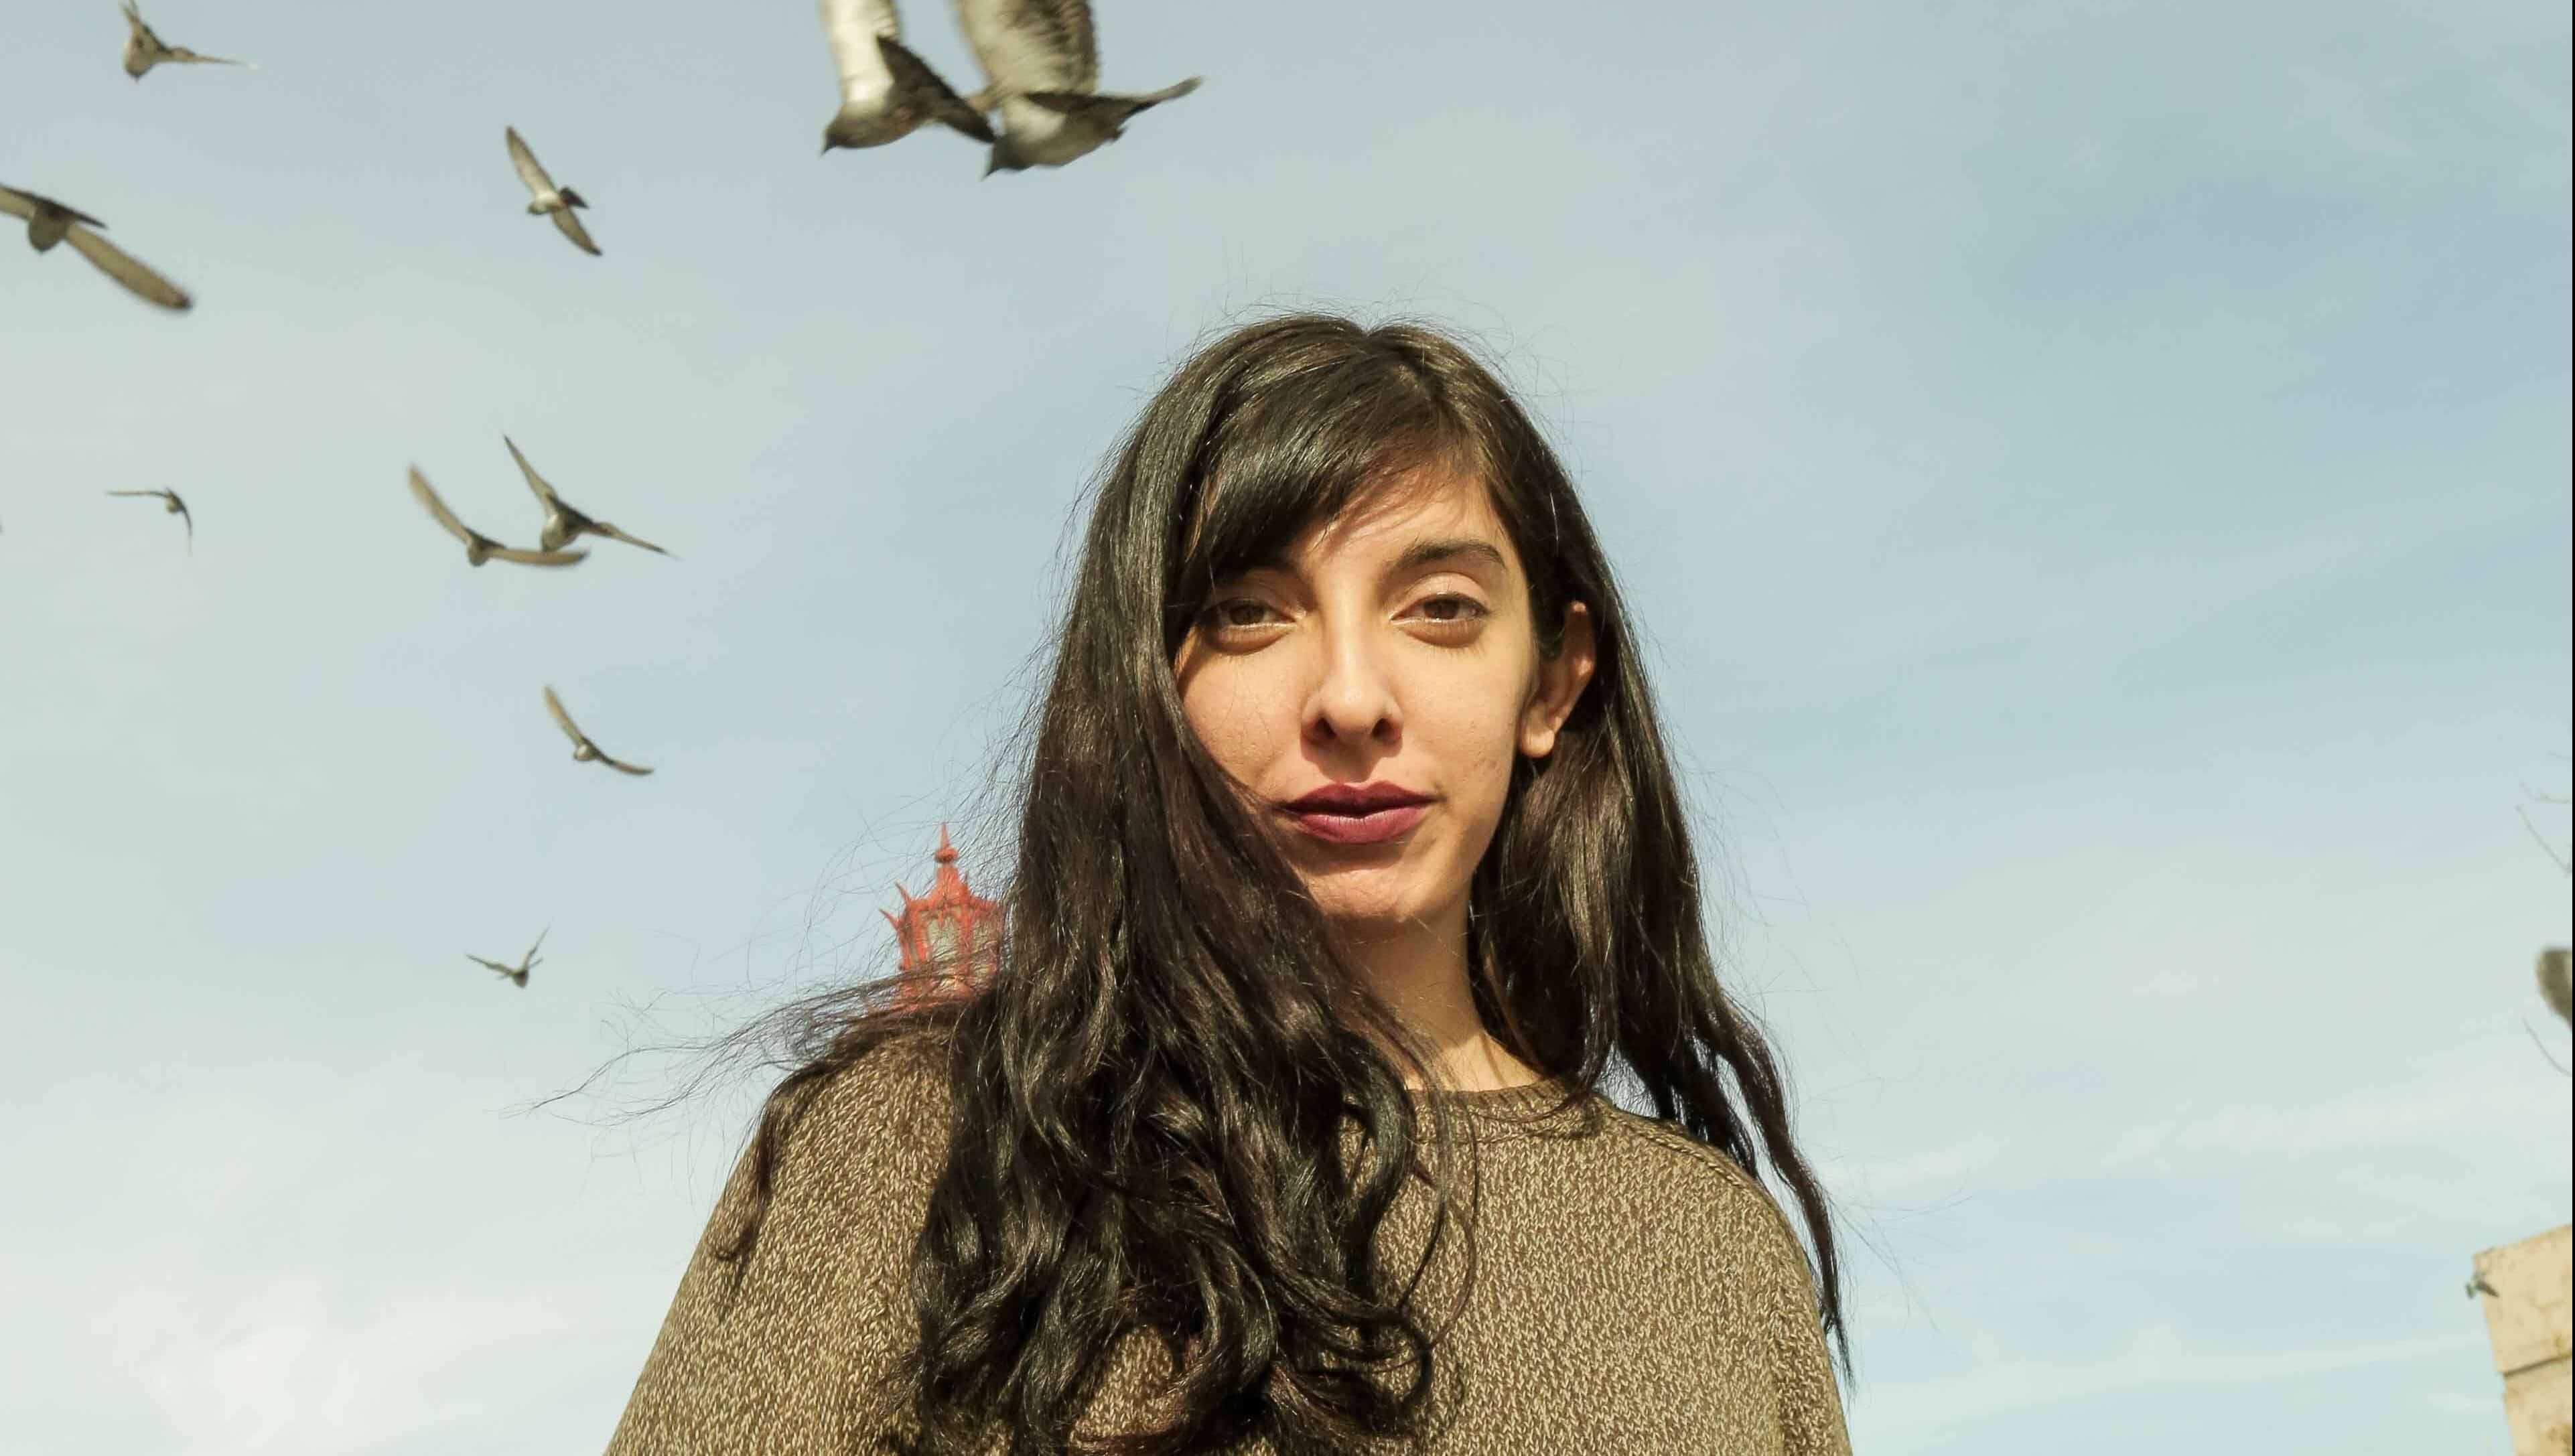 5 Juarez Artists on Redefining the City's Narrative of Violence